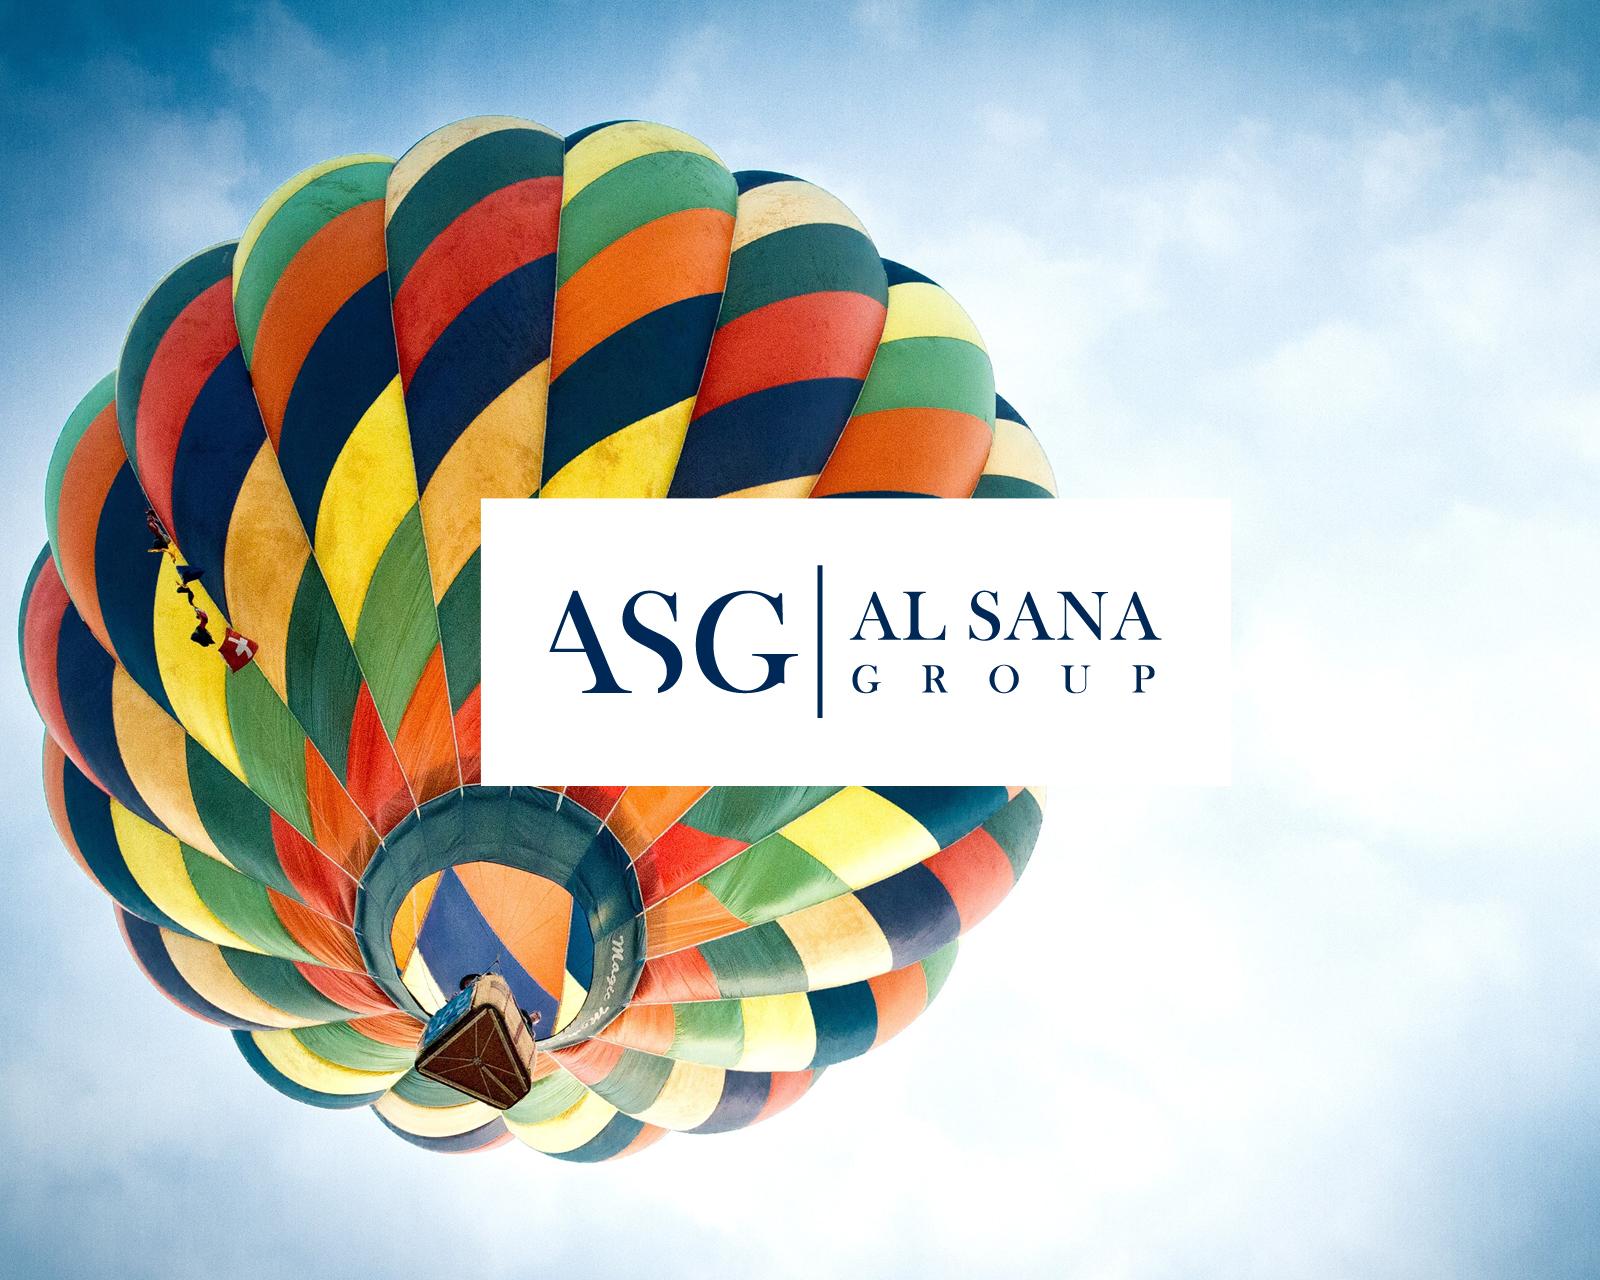 Al Sana Group